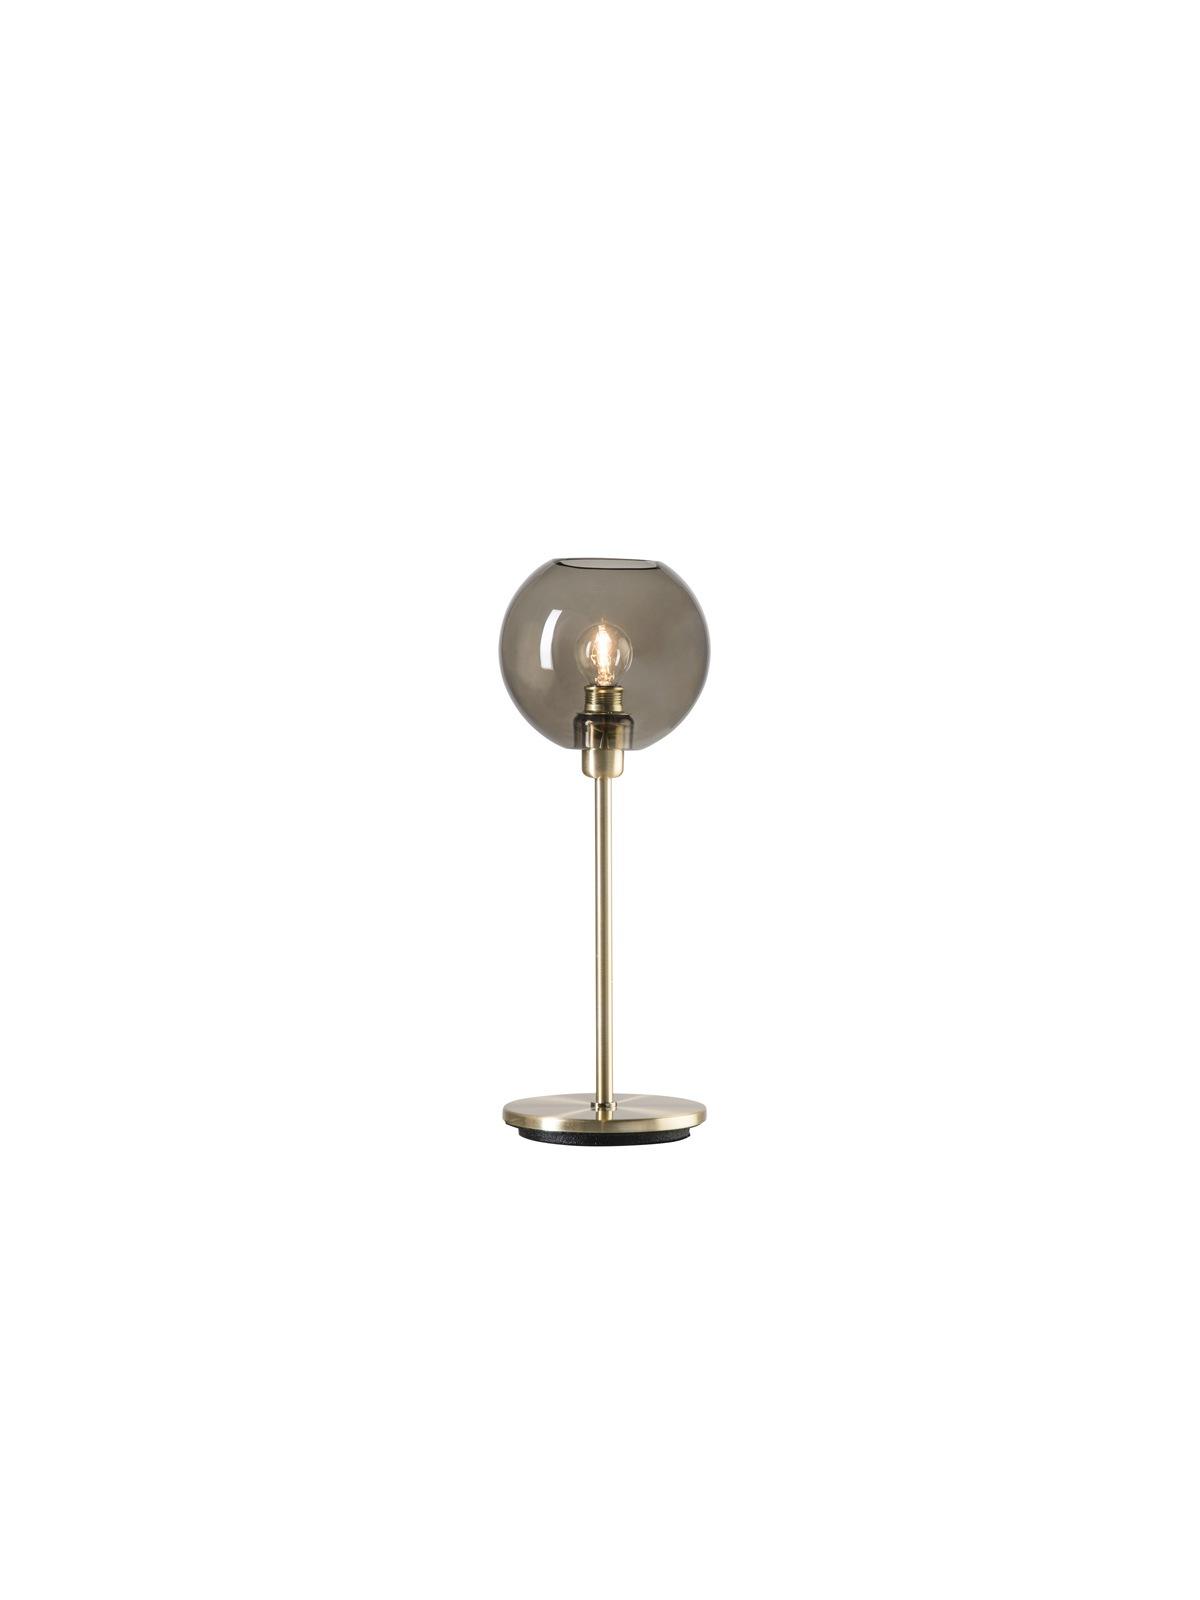 Belid Gloria T Tischleuchte mit Glasschirm DesignOrt Onlineshop Lampen Berlin